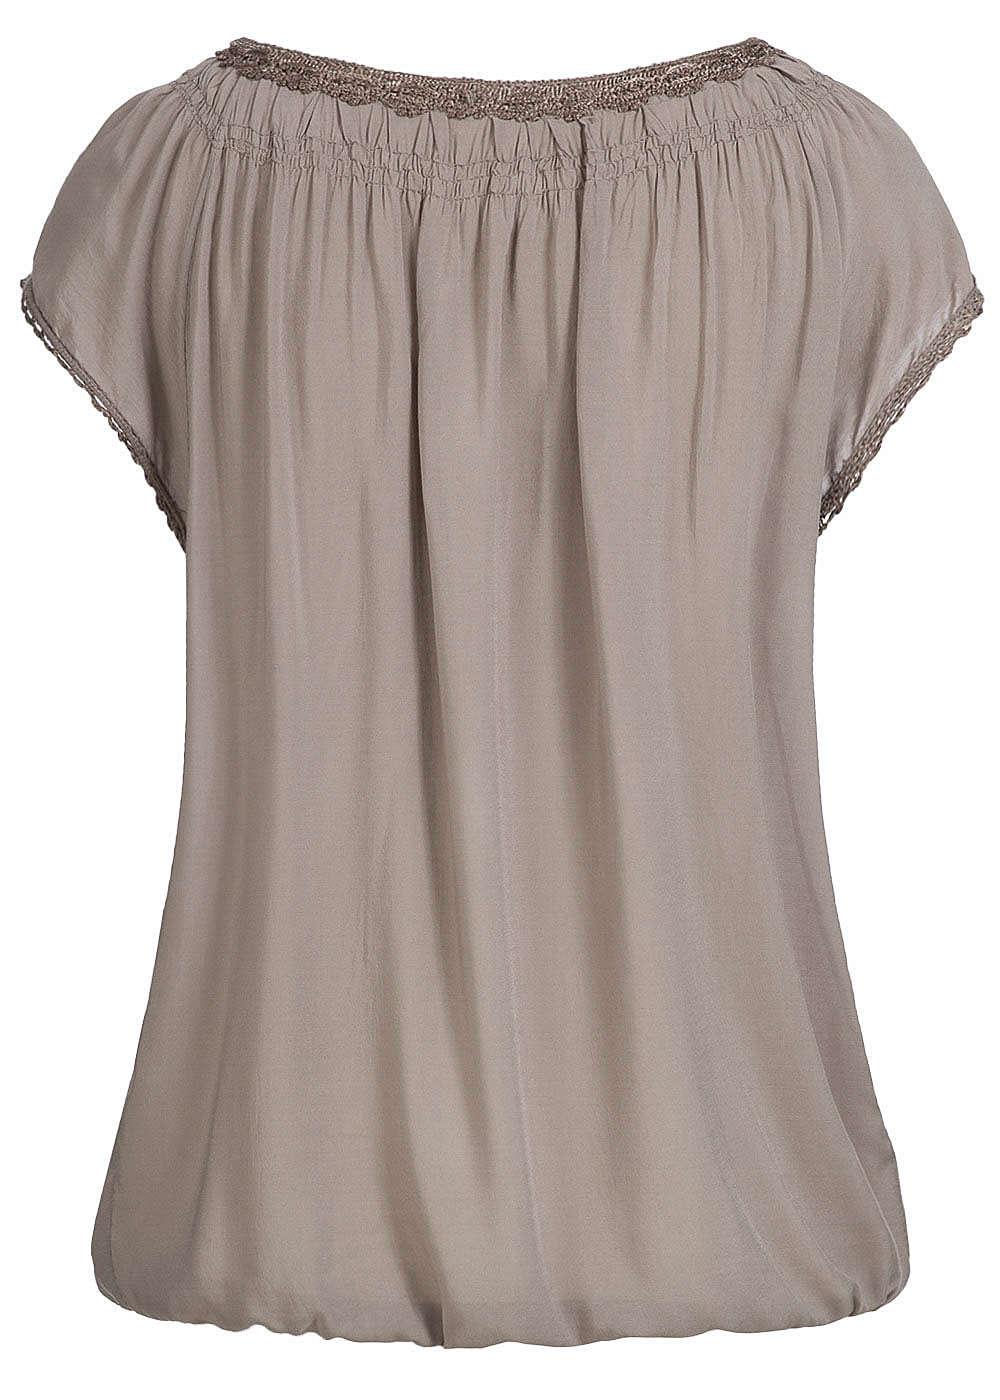 bluse mit gummizug am bund blusen marc o 39 polo bluse. Black Bedroom Furniture Sets. Home Design Ideas